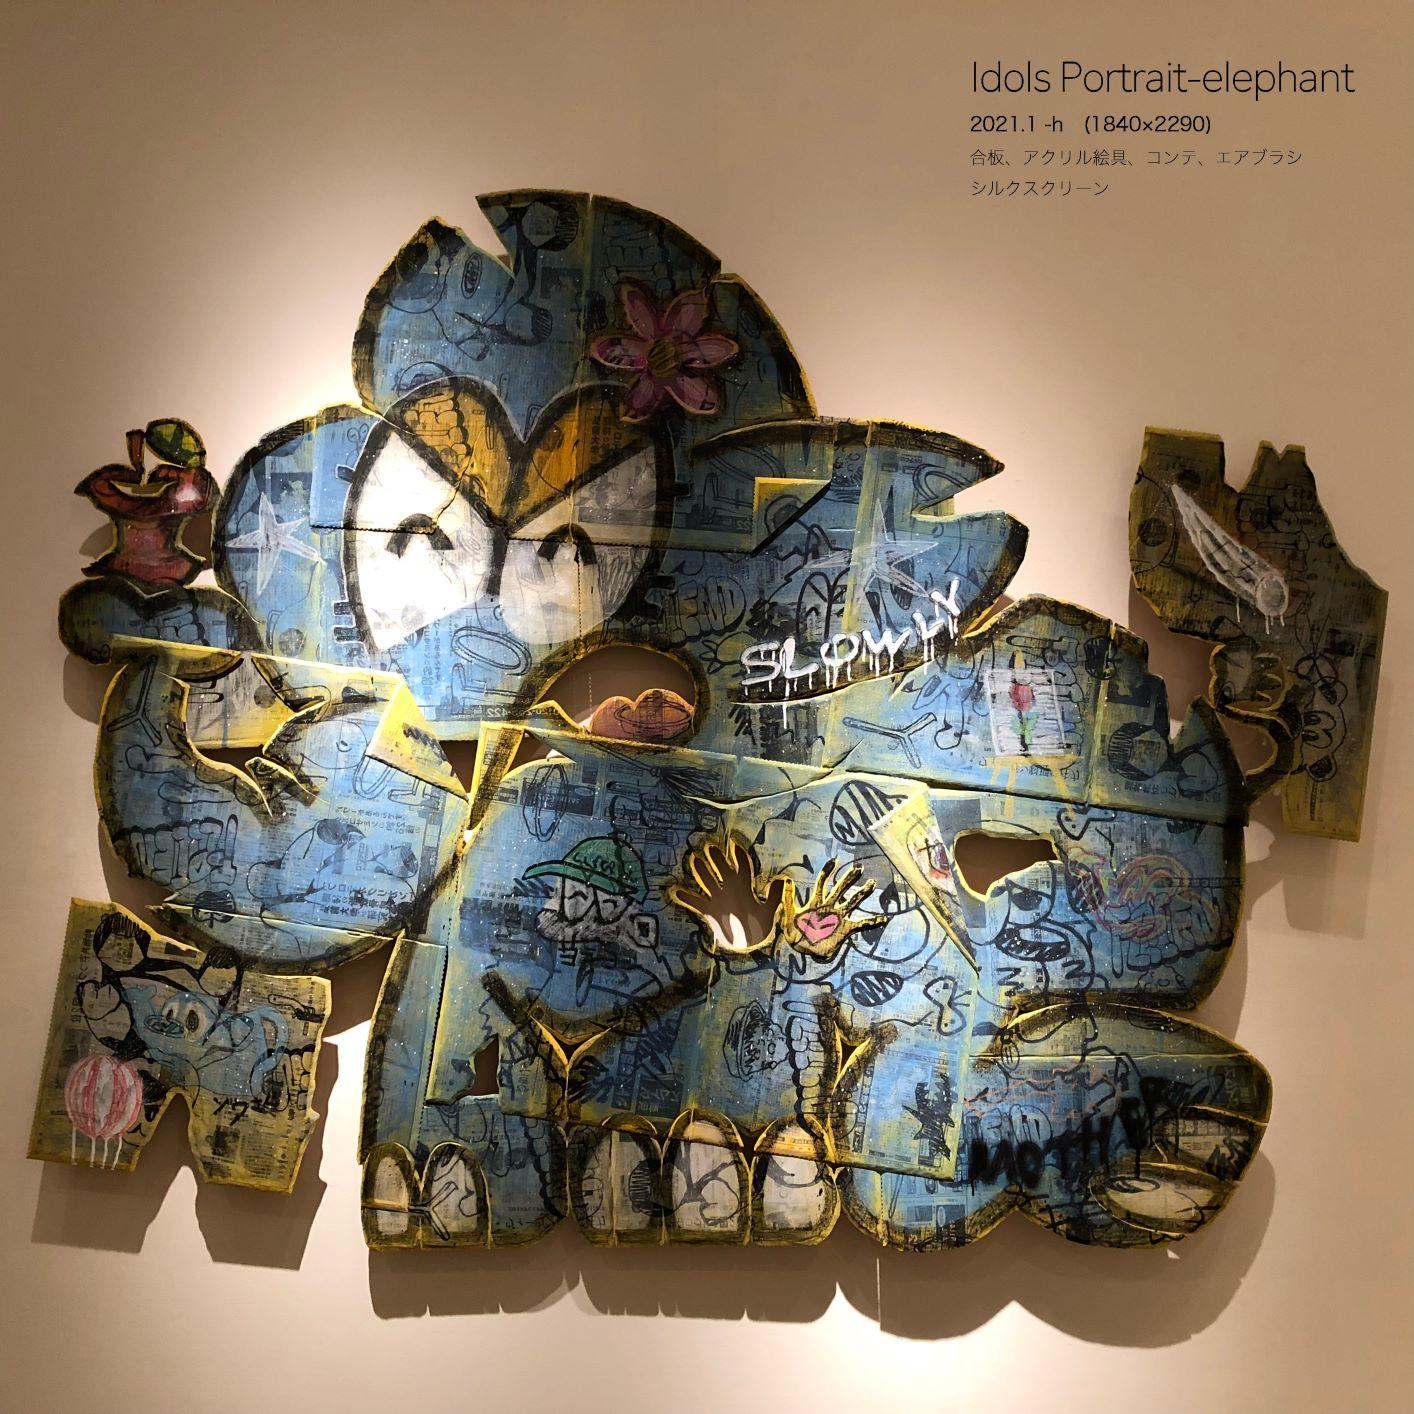 Idols Portrait-elephant